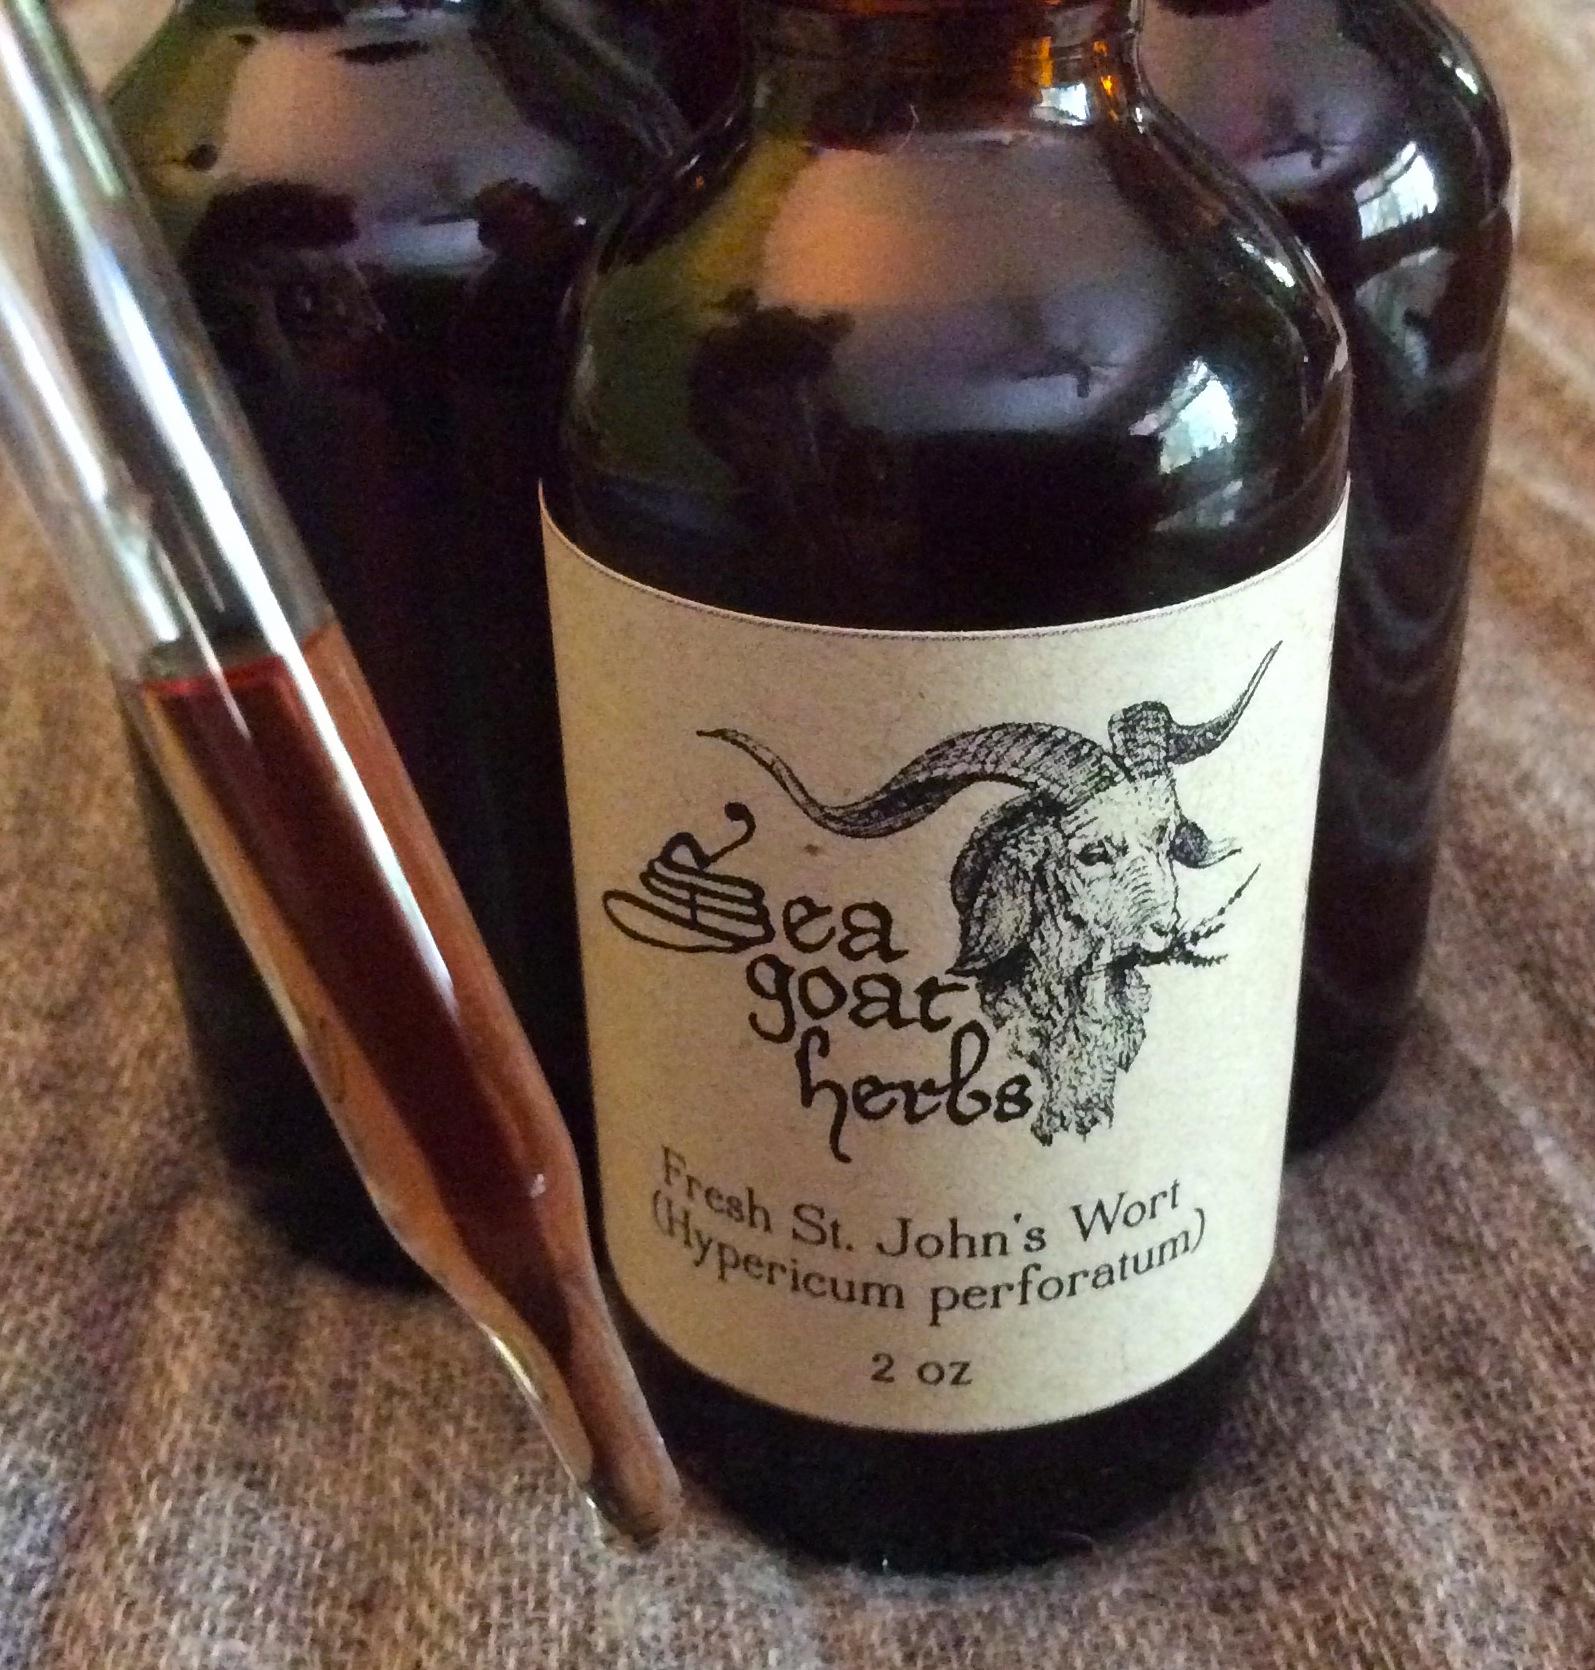 Pressed & strained tincture of St. John's Wort; $24 per 2oz bottle